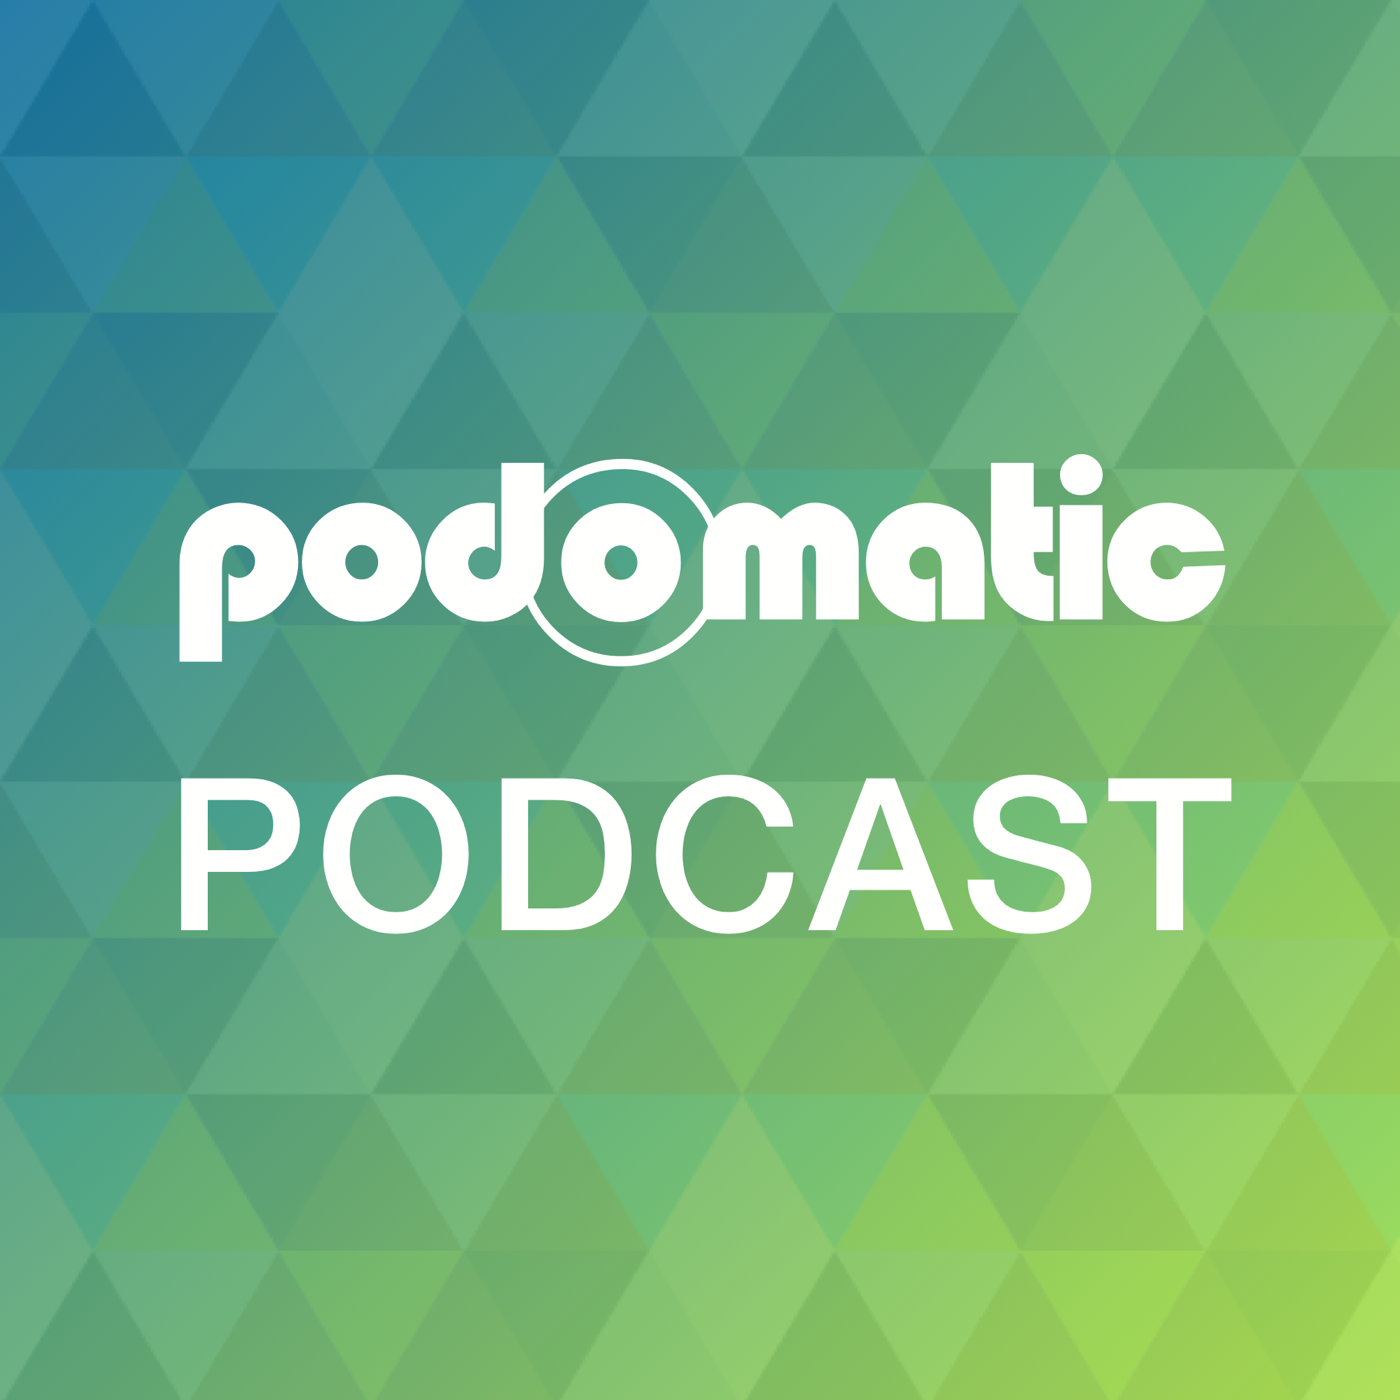 rachal chilo's Podcast